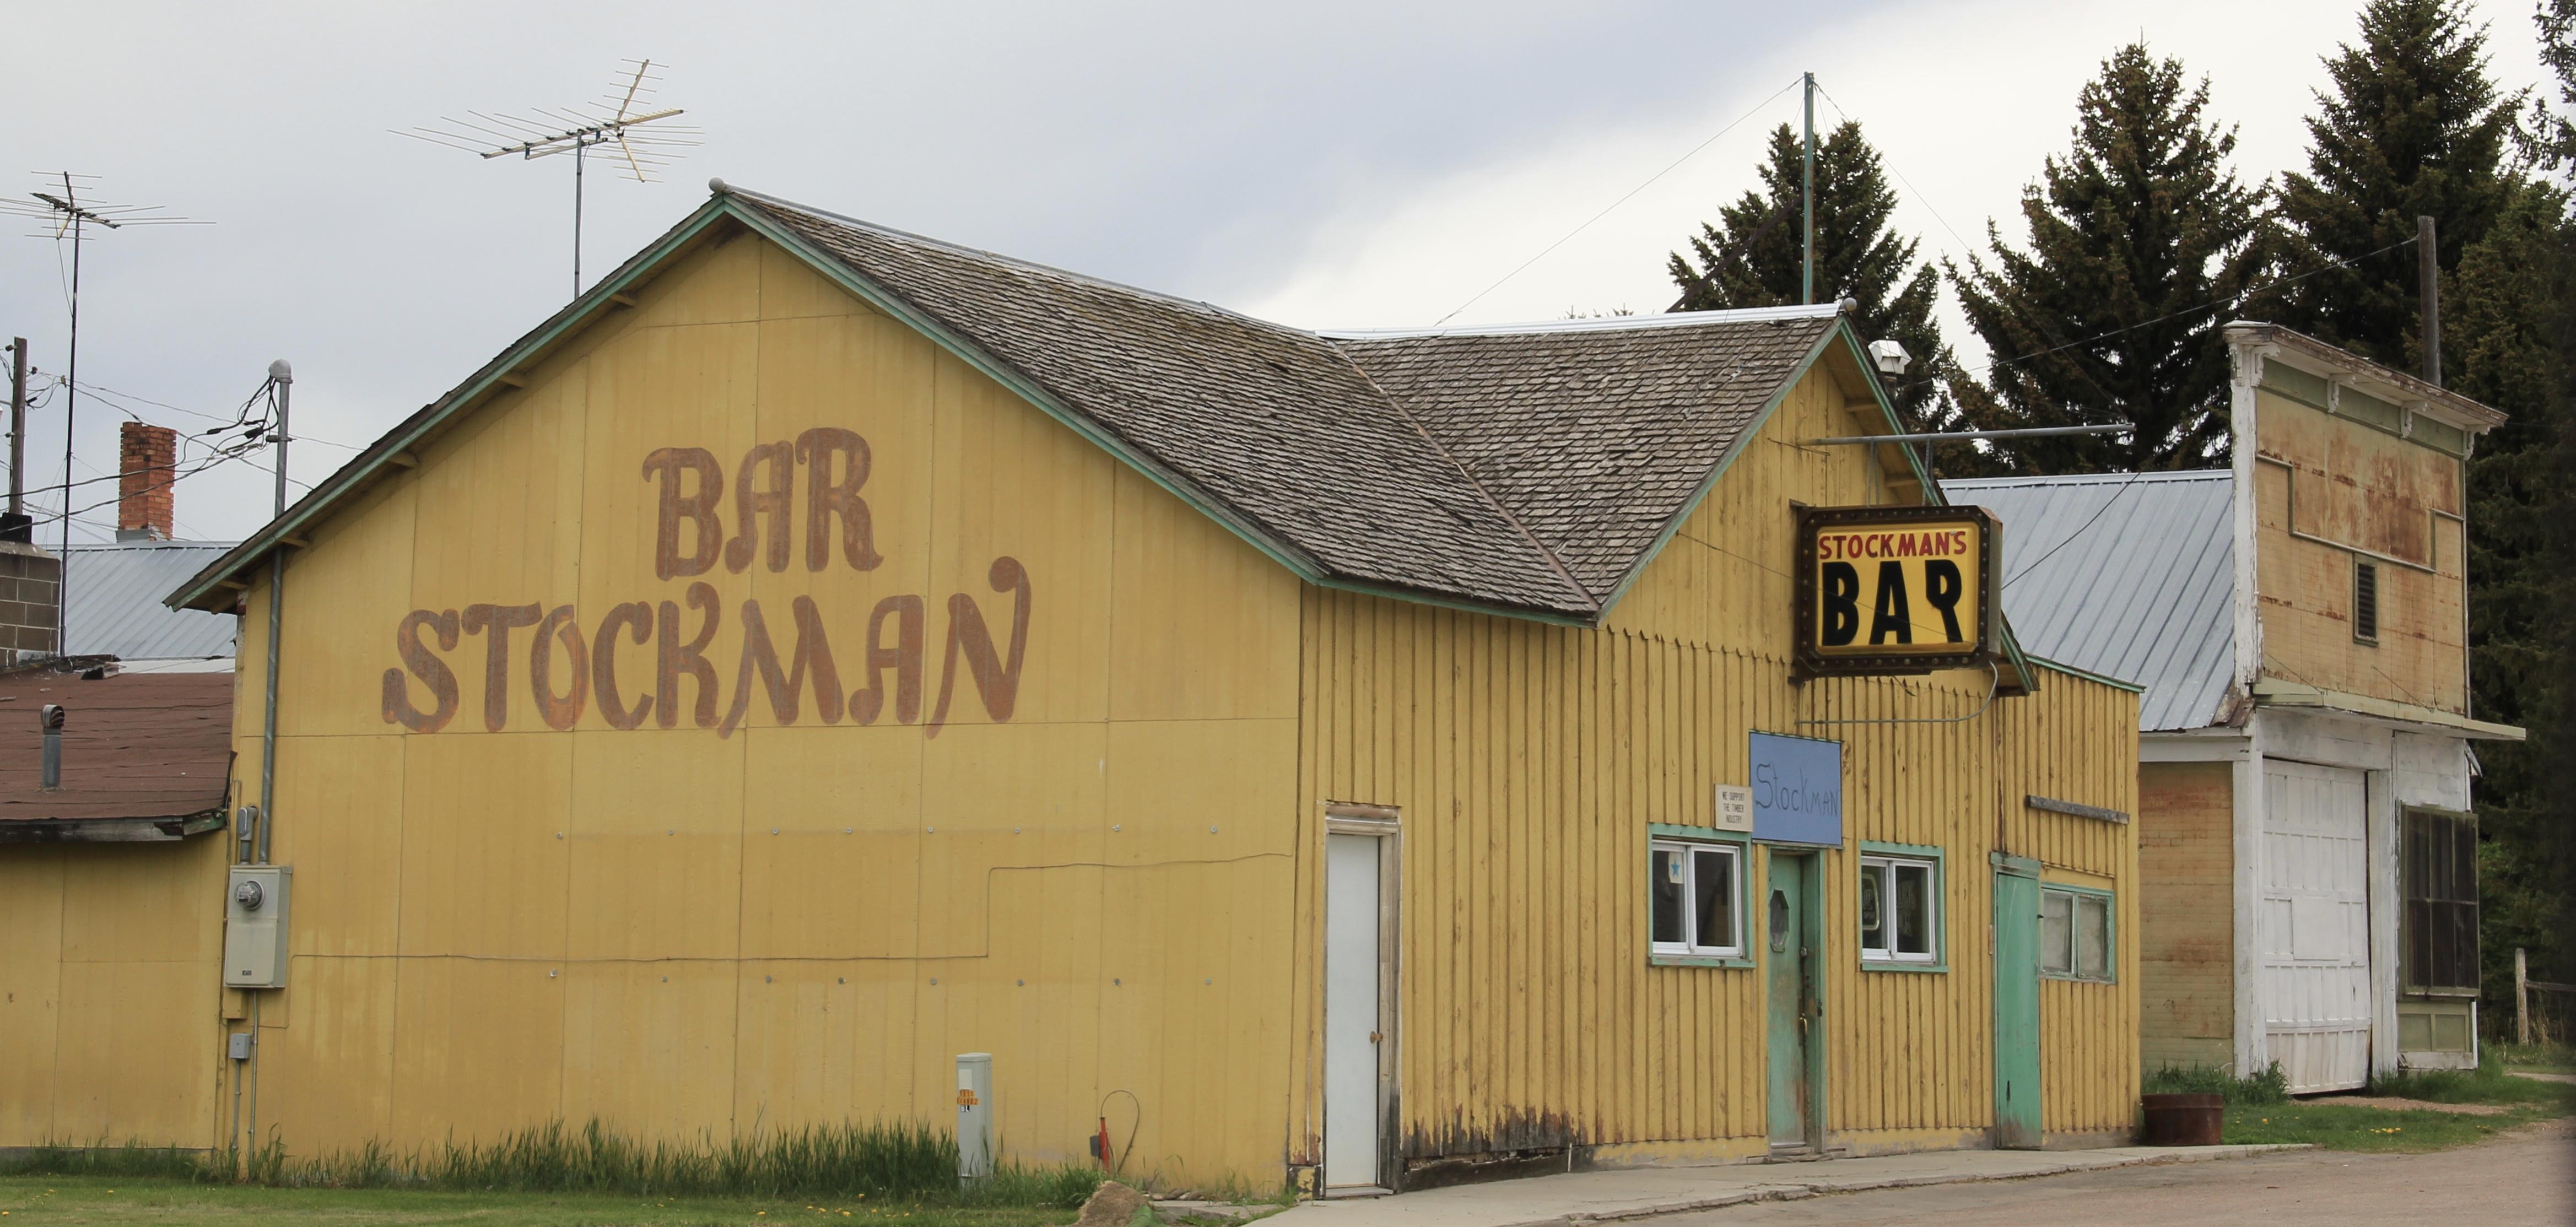 Granite Co, Stockman bar and store, MT 513, HALL